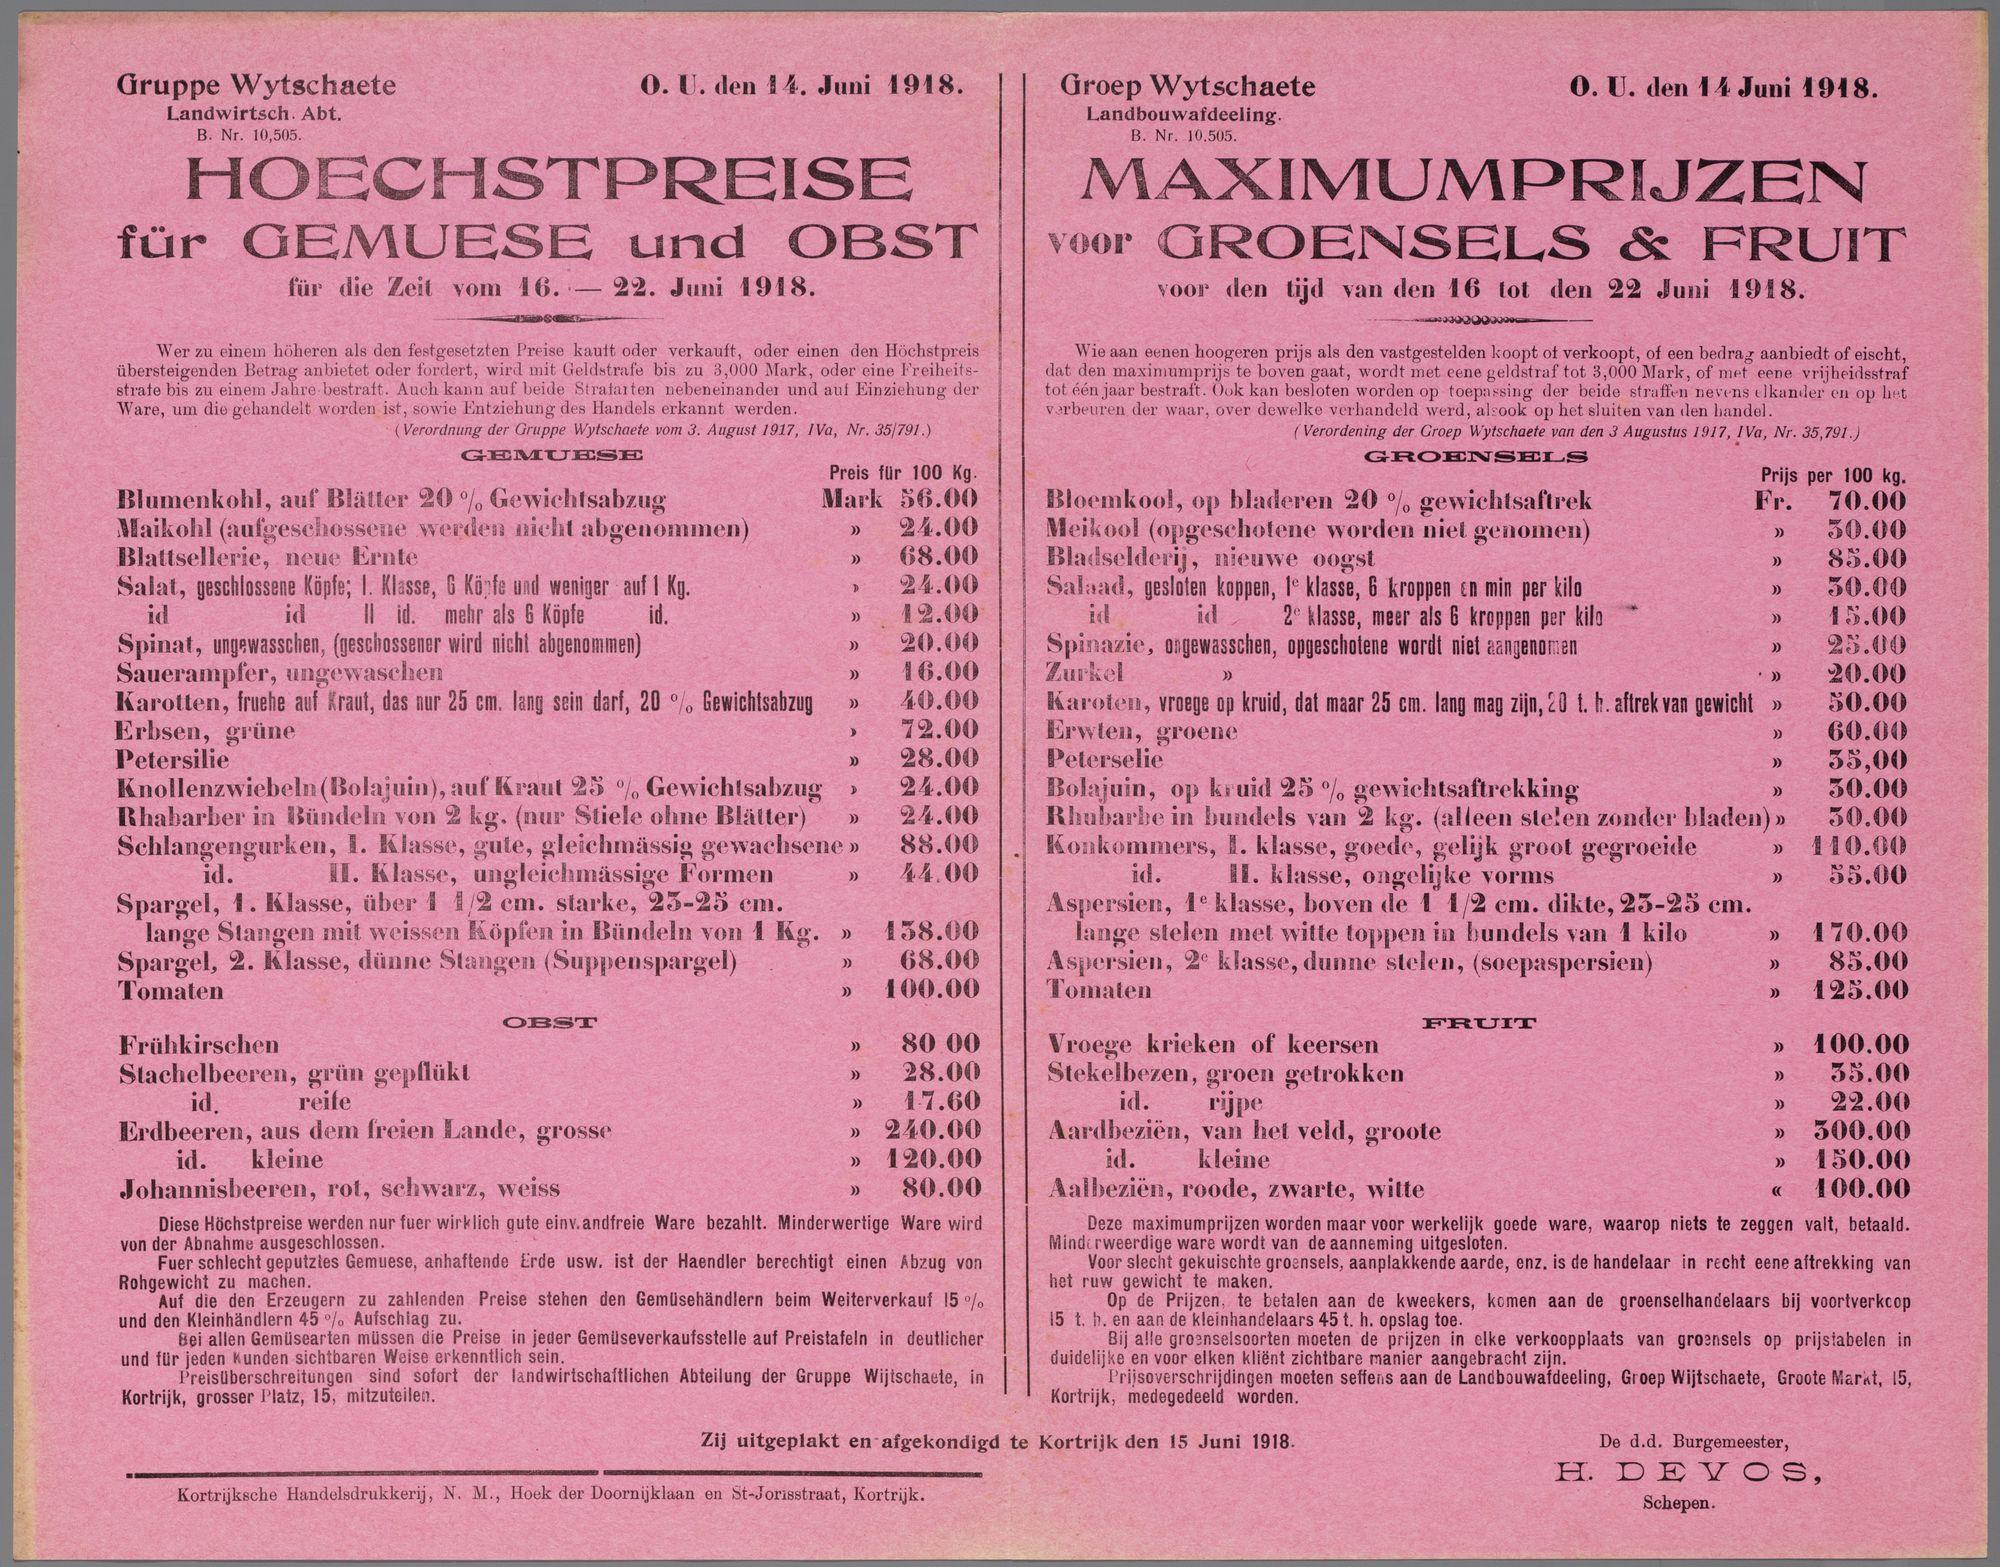 Landbouwafdeling Groep Wytschaete 1918